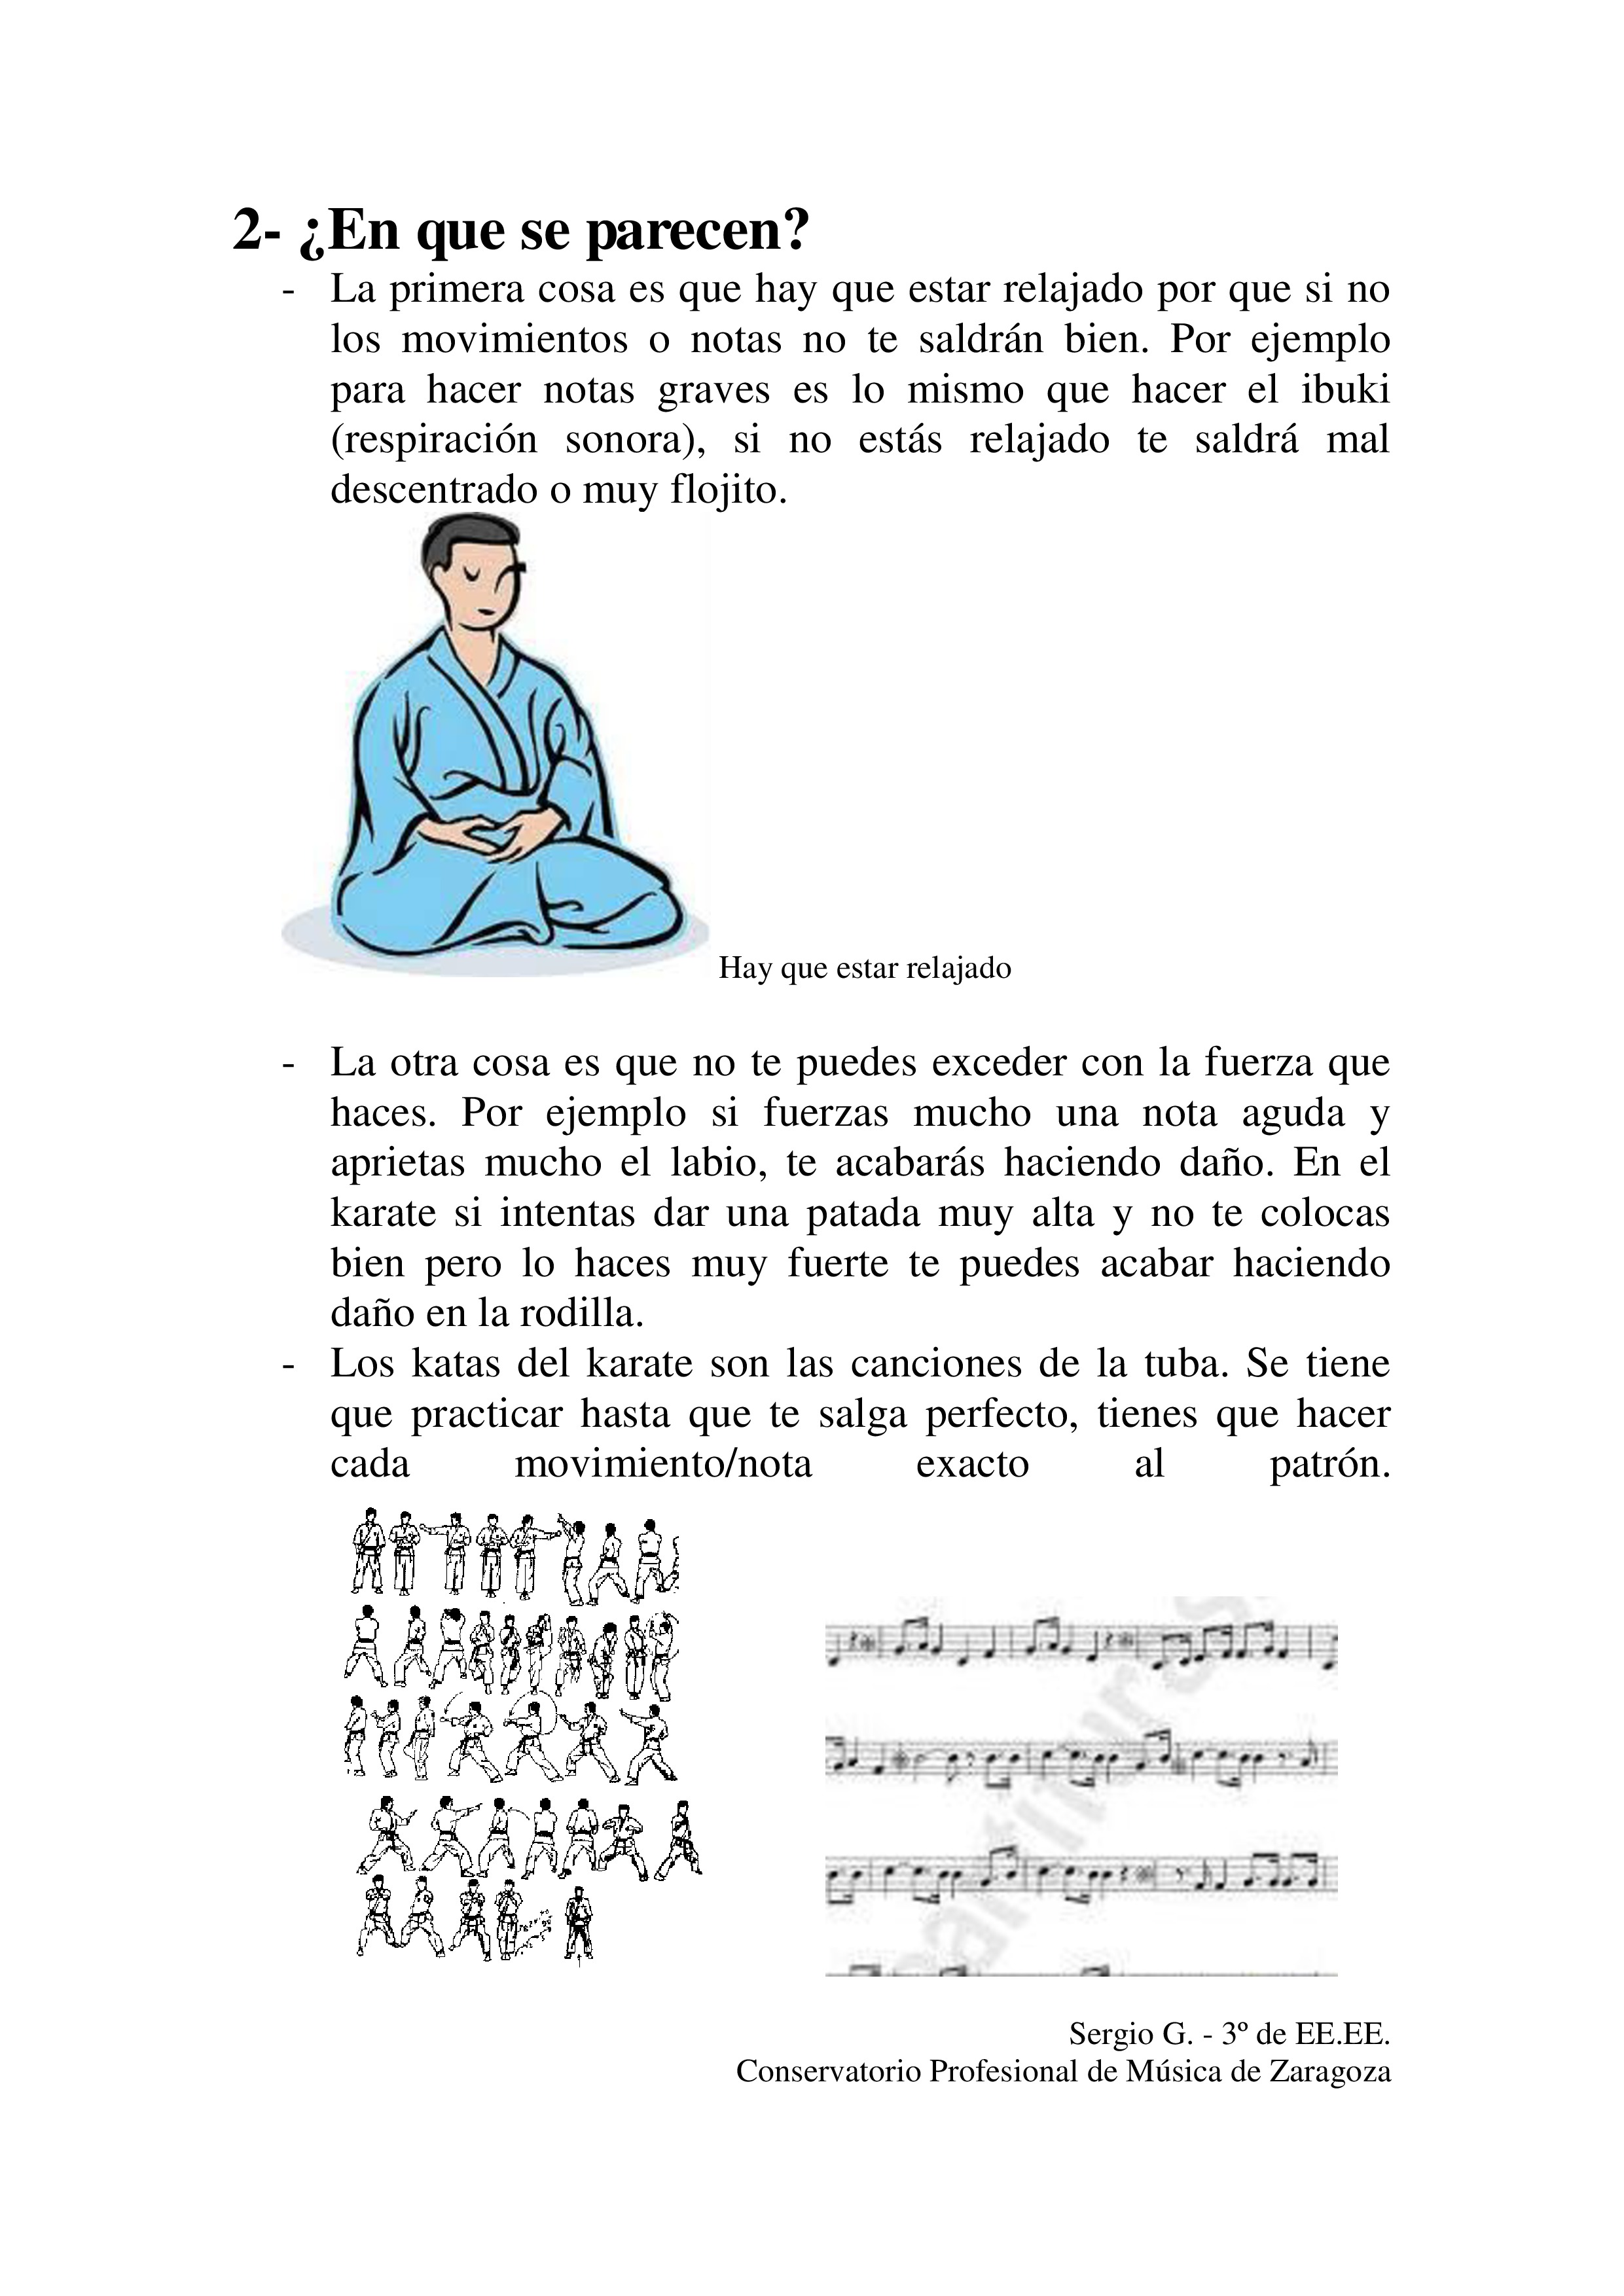 Tuba y Karate 2